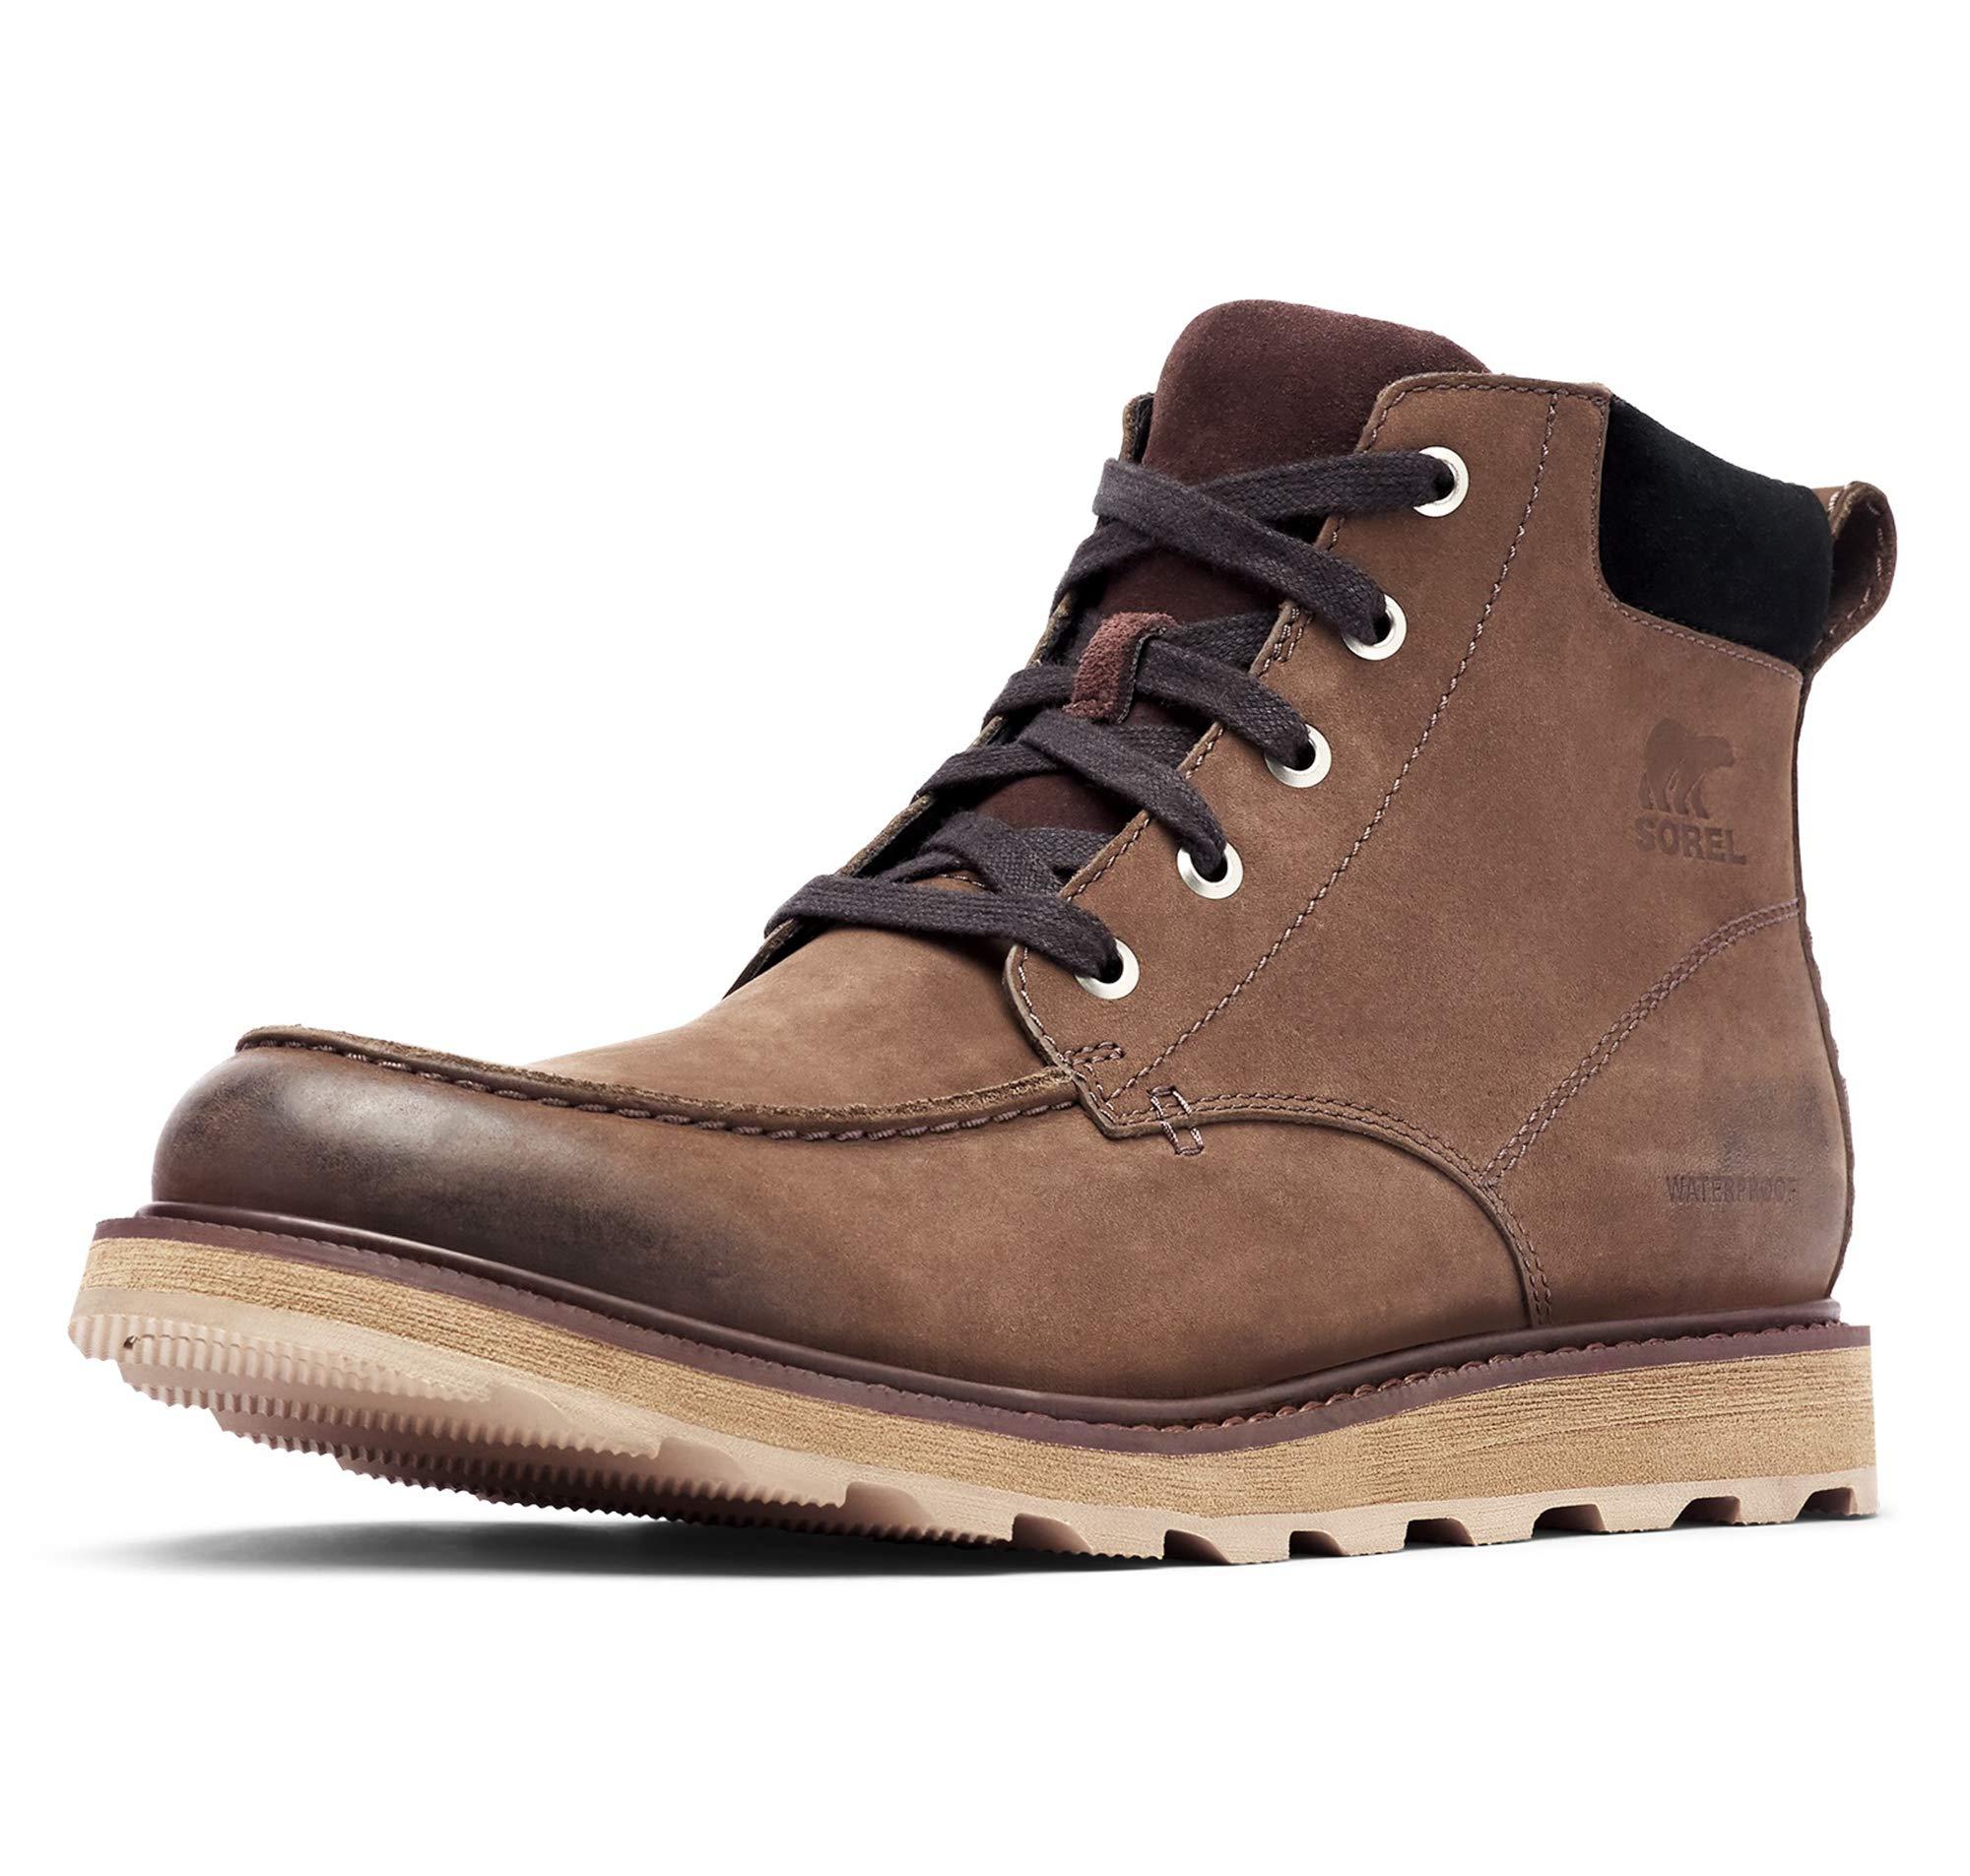 Sorel - Men's Madson Moc Toe Waterproof Boot, All-Weather Footwear for Everyday Wear, Bruno/Black, 10.5 M US by Sorel